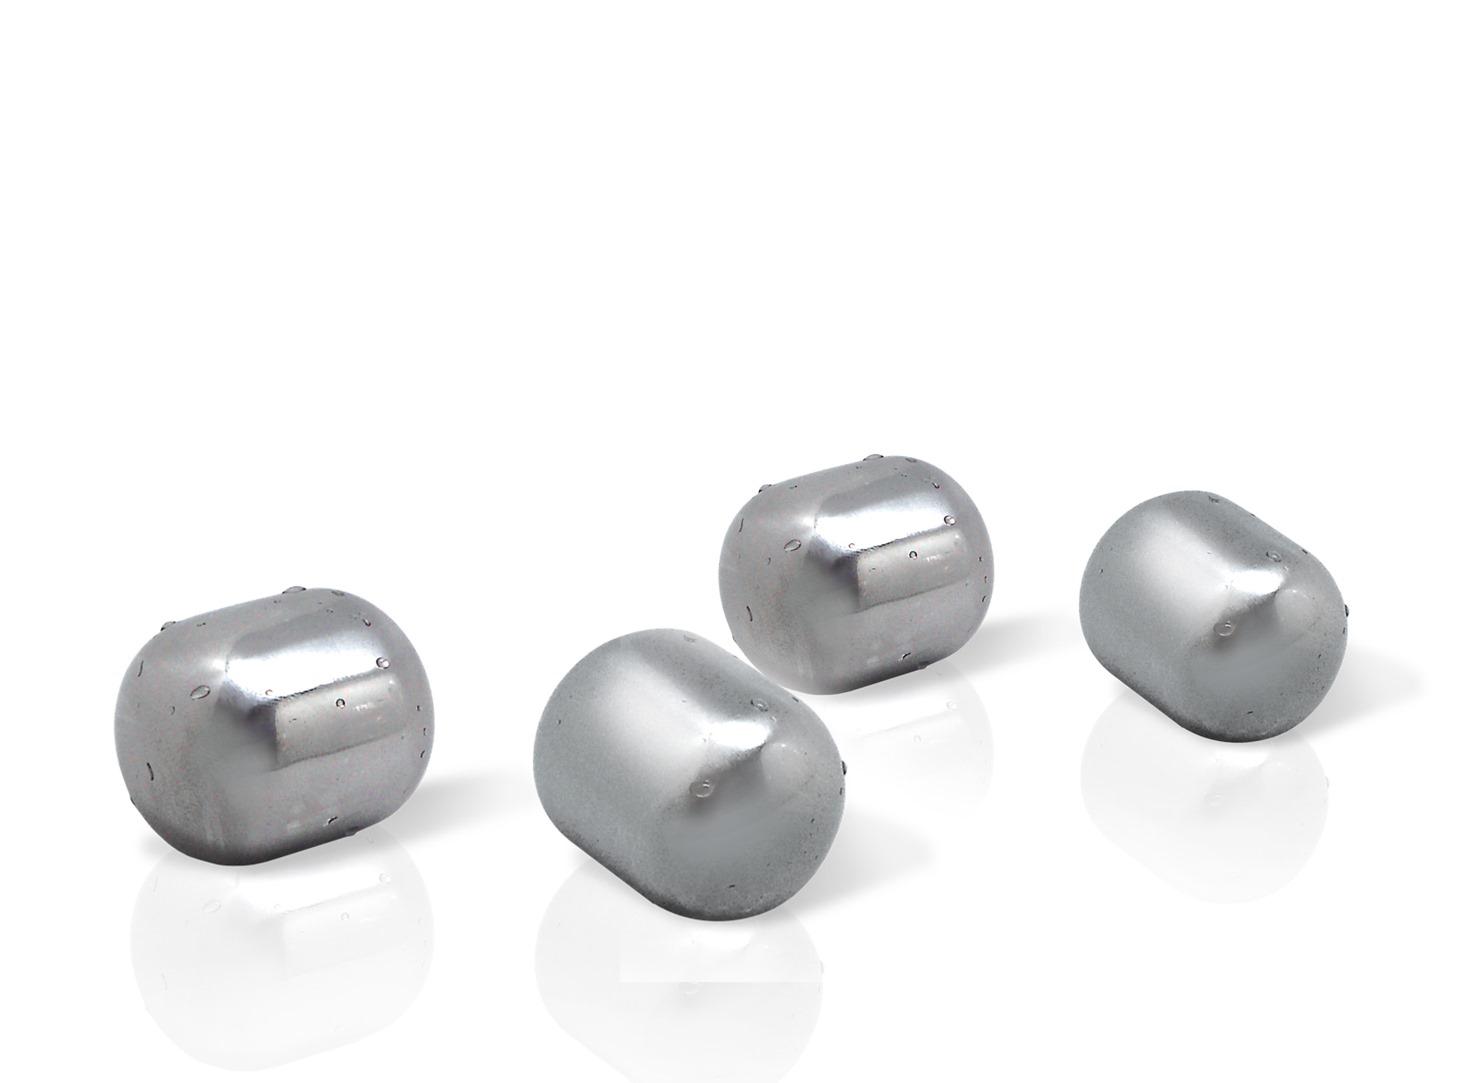 Онлайн каталог PROMENU: Камни для охлаждения металлические VinBouquet TO CHILL, 4 штуки                               FIE 019